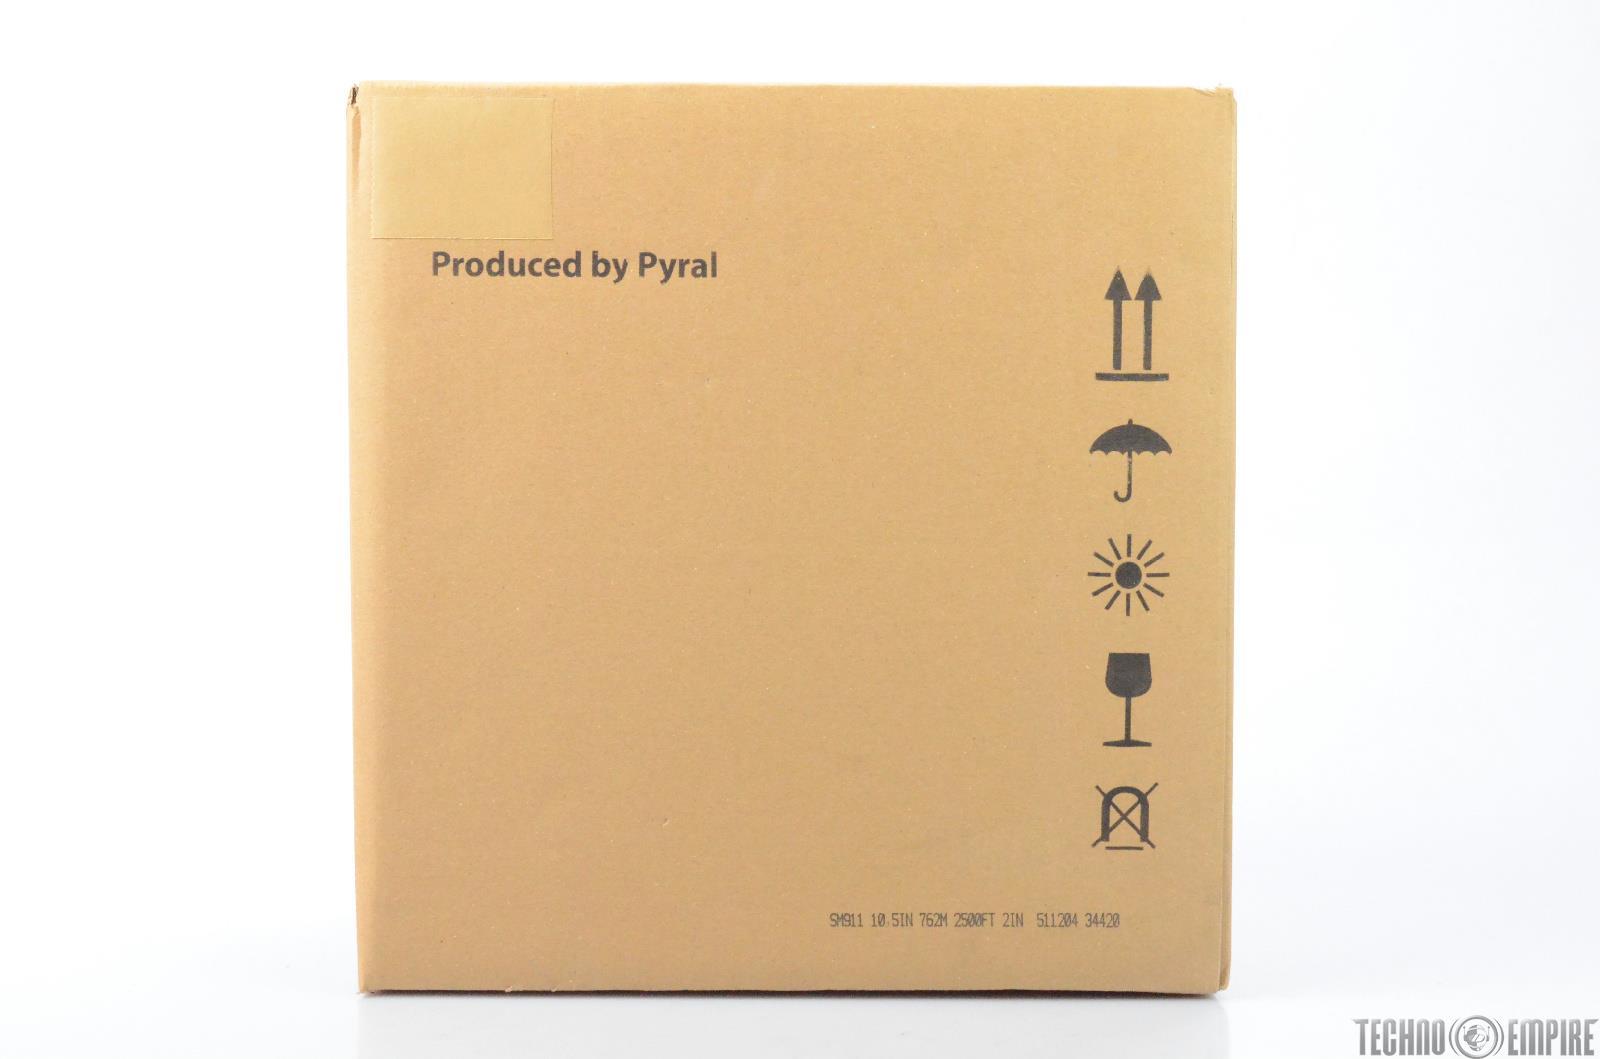 "Pyral SM911 Studio Master 911 2"" Tape NAB Reels Fairfax Recordings #28603"